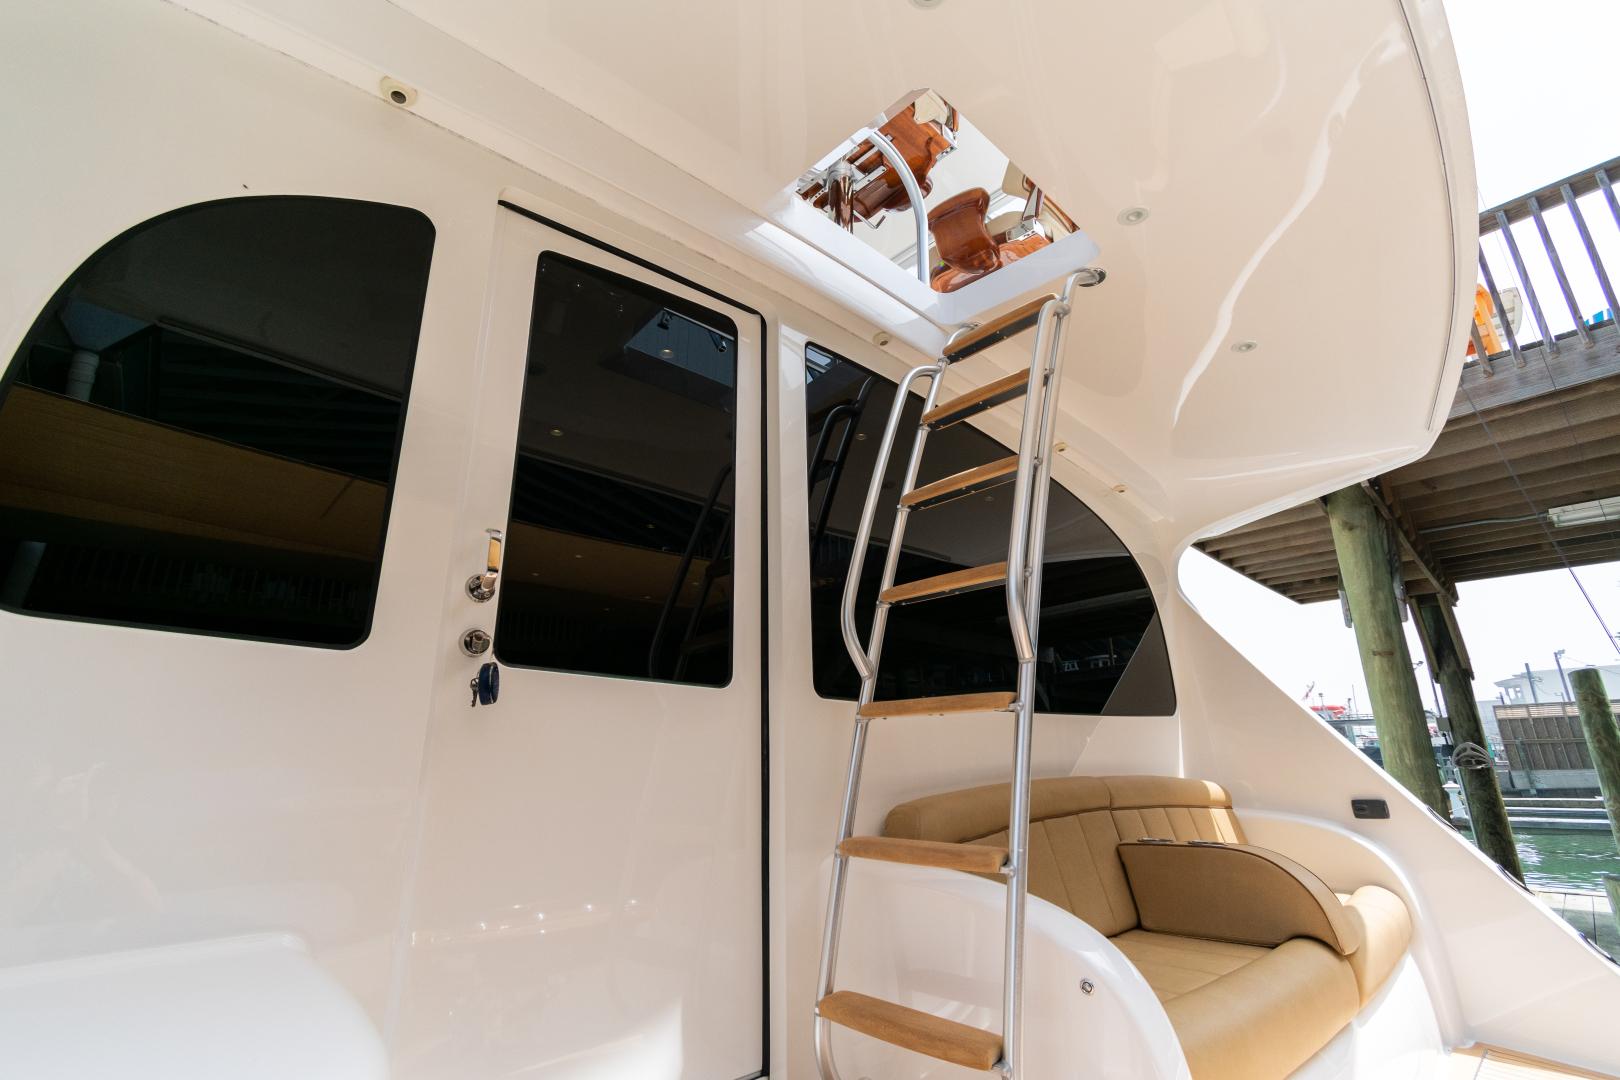 Viking-70 Convertible 2014-Load N Go Port Aransas-Texas-United States-2014 70 Viking Load N Go Cockpit (7)-1380616 | Thumbnail